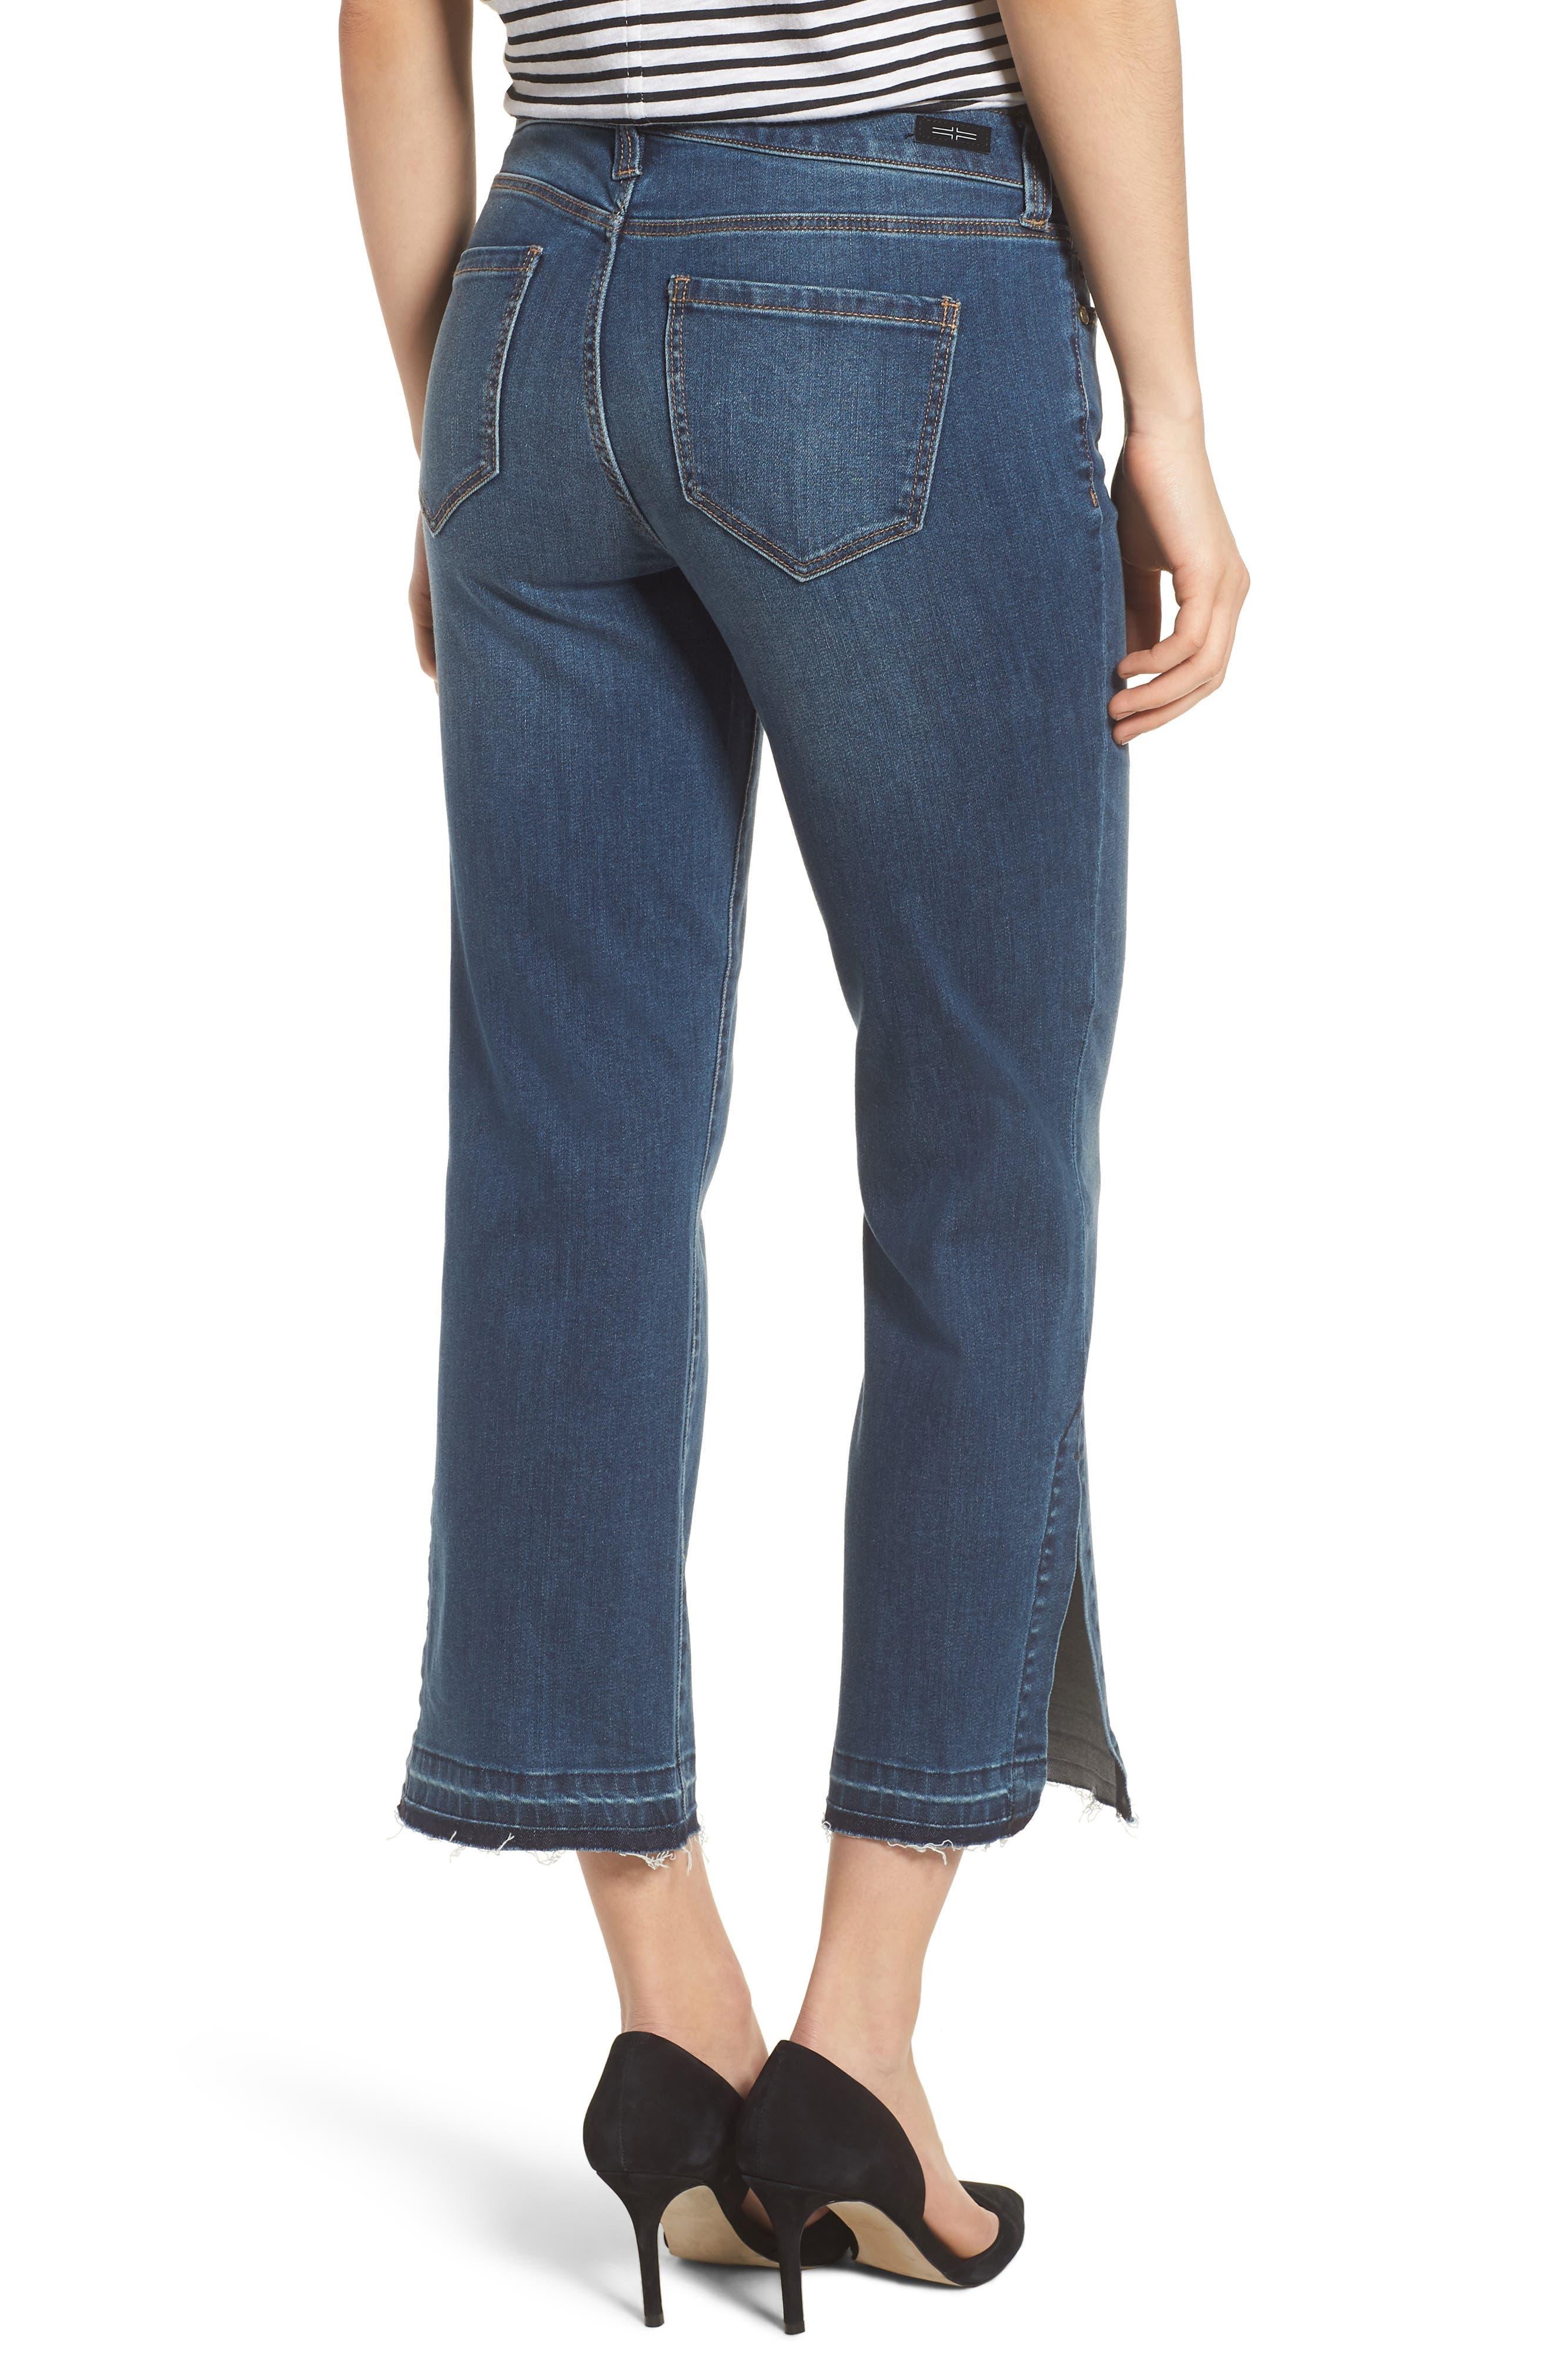 Tabitha Release Hem Crop Jeans,                             Alternate thumbnail 2, color,                             403